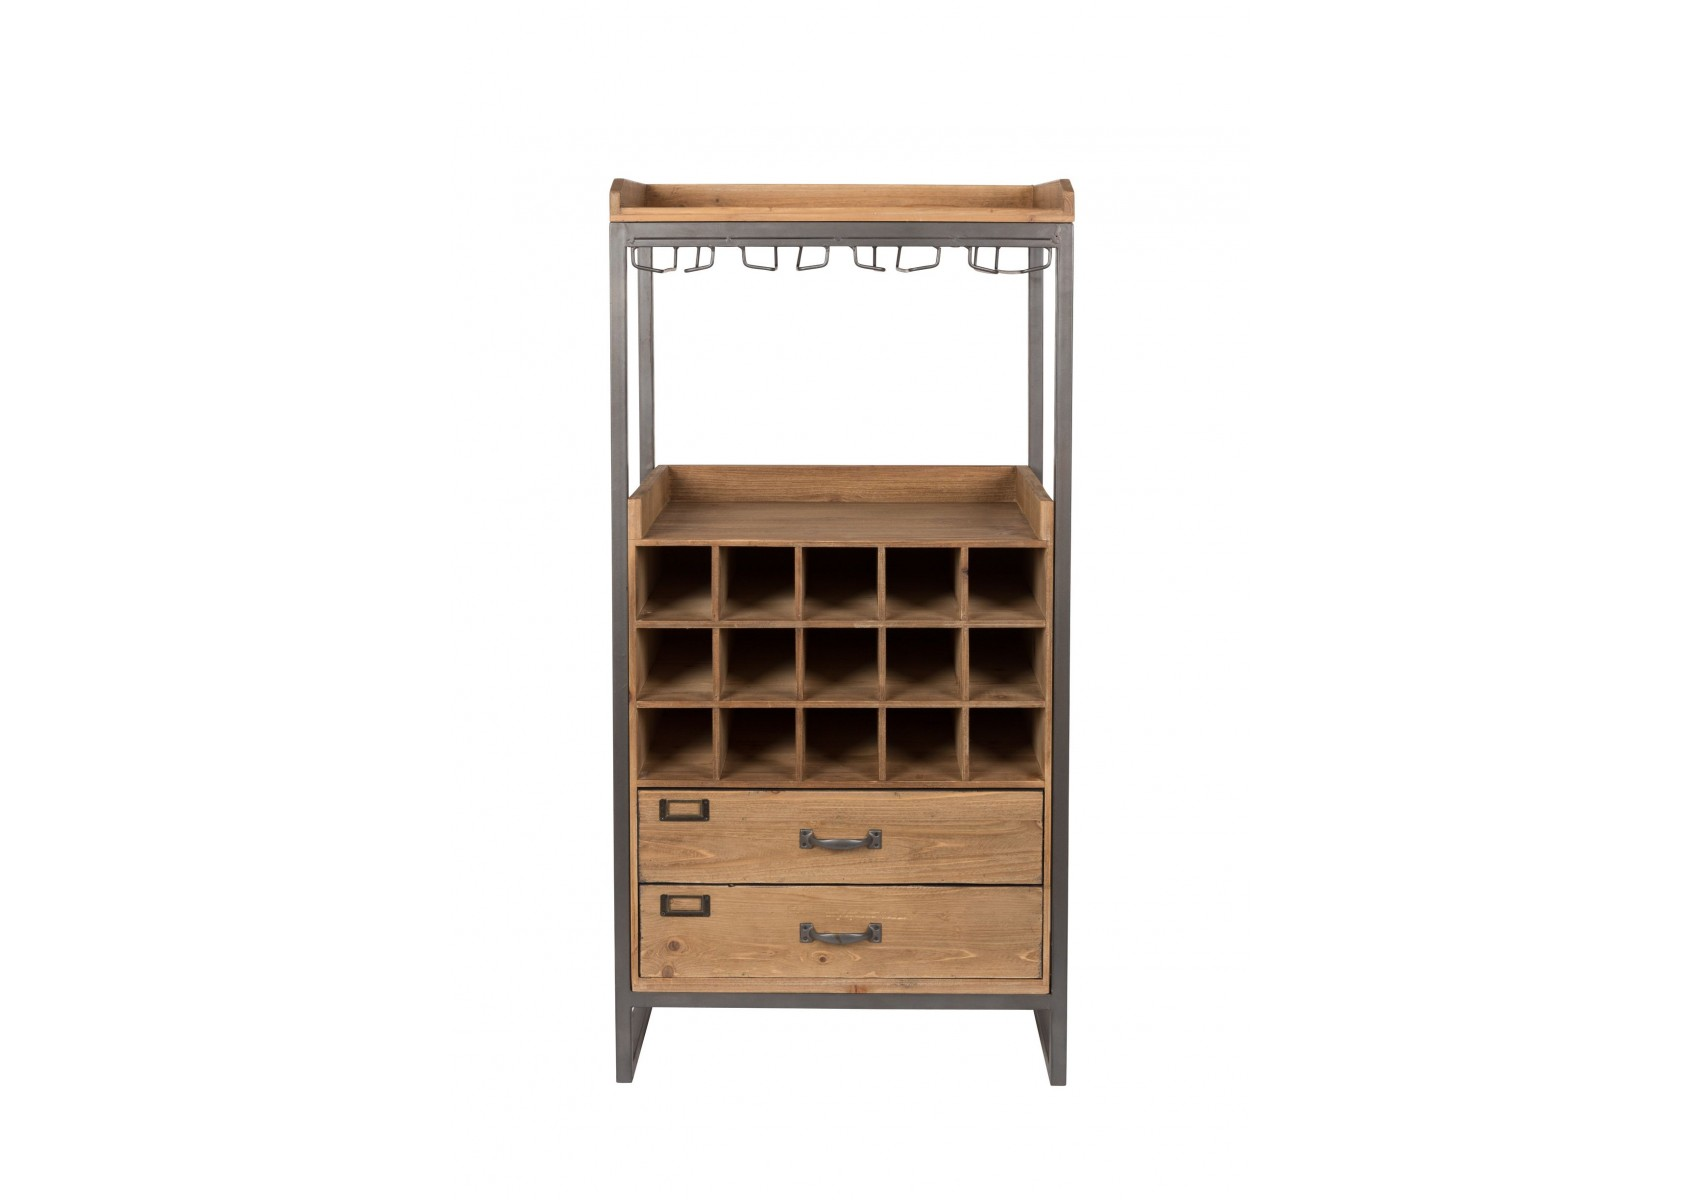 meuble bar vin en bois et m tal edgar boite design. Black Bedroom Furniture Sets. Home Design Ideas